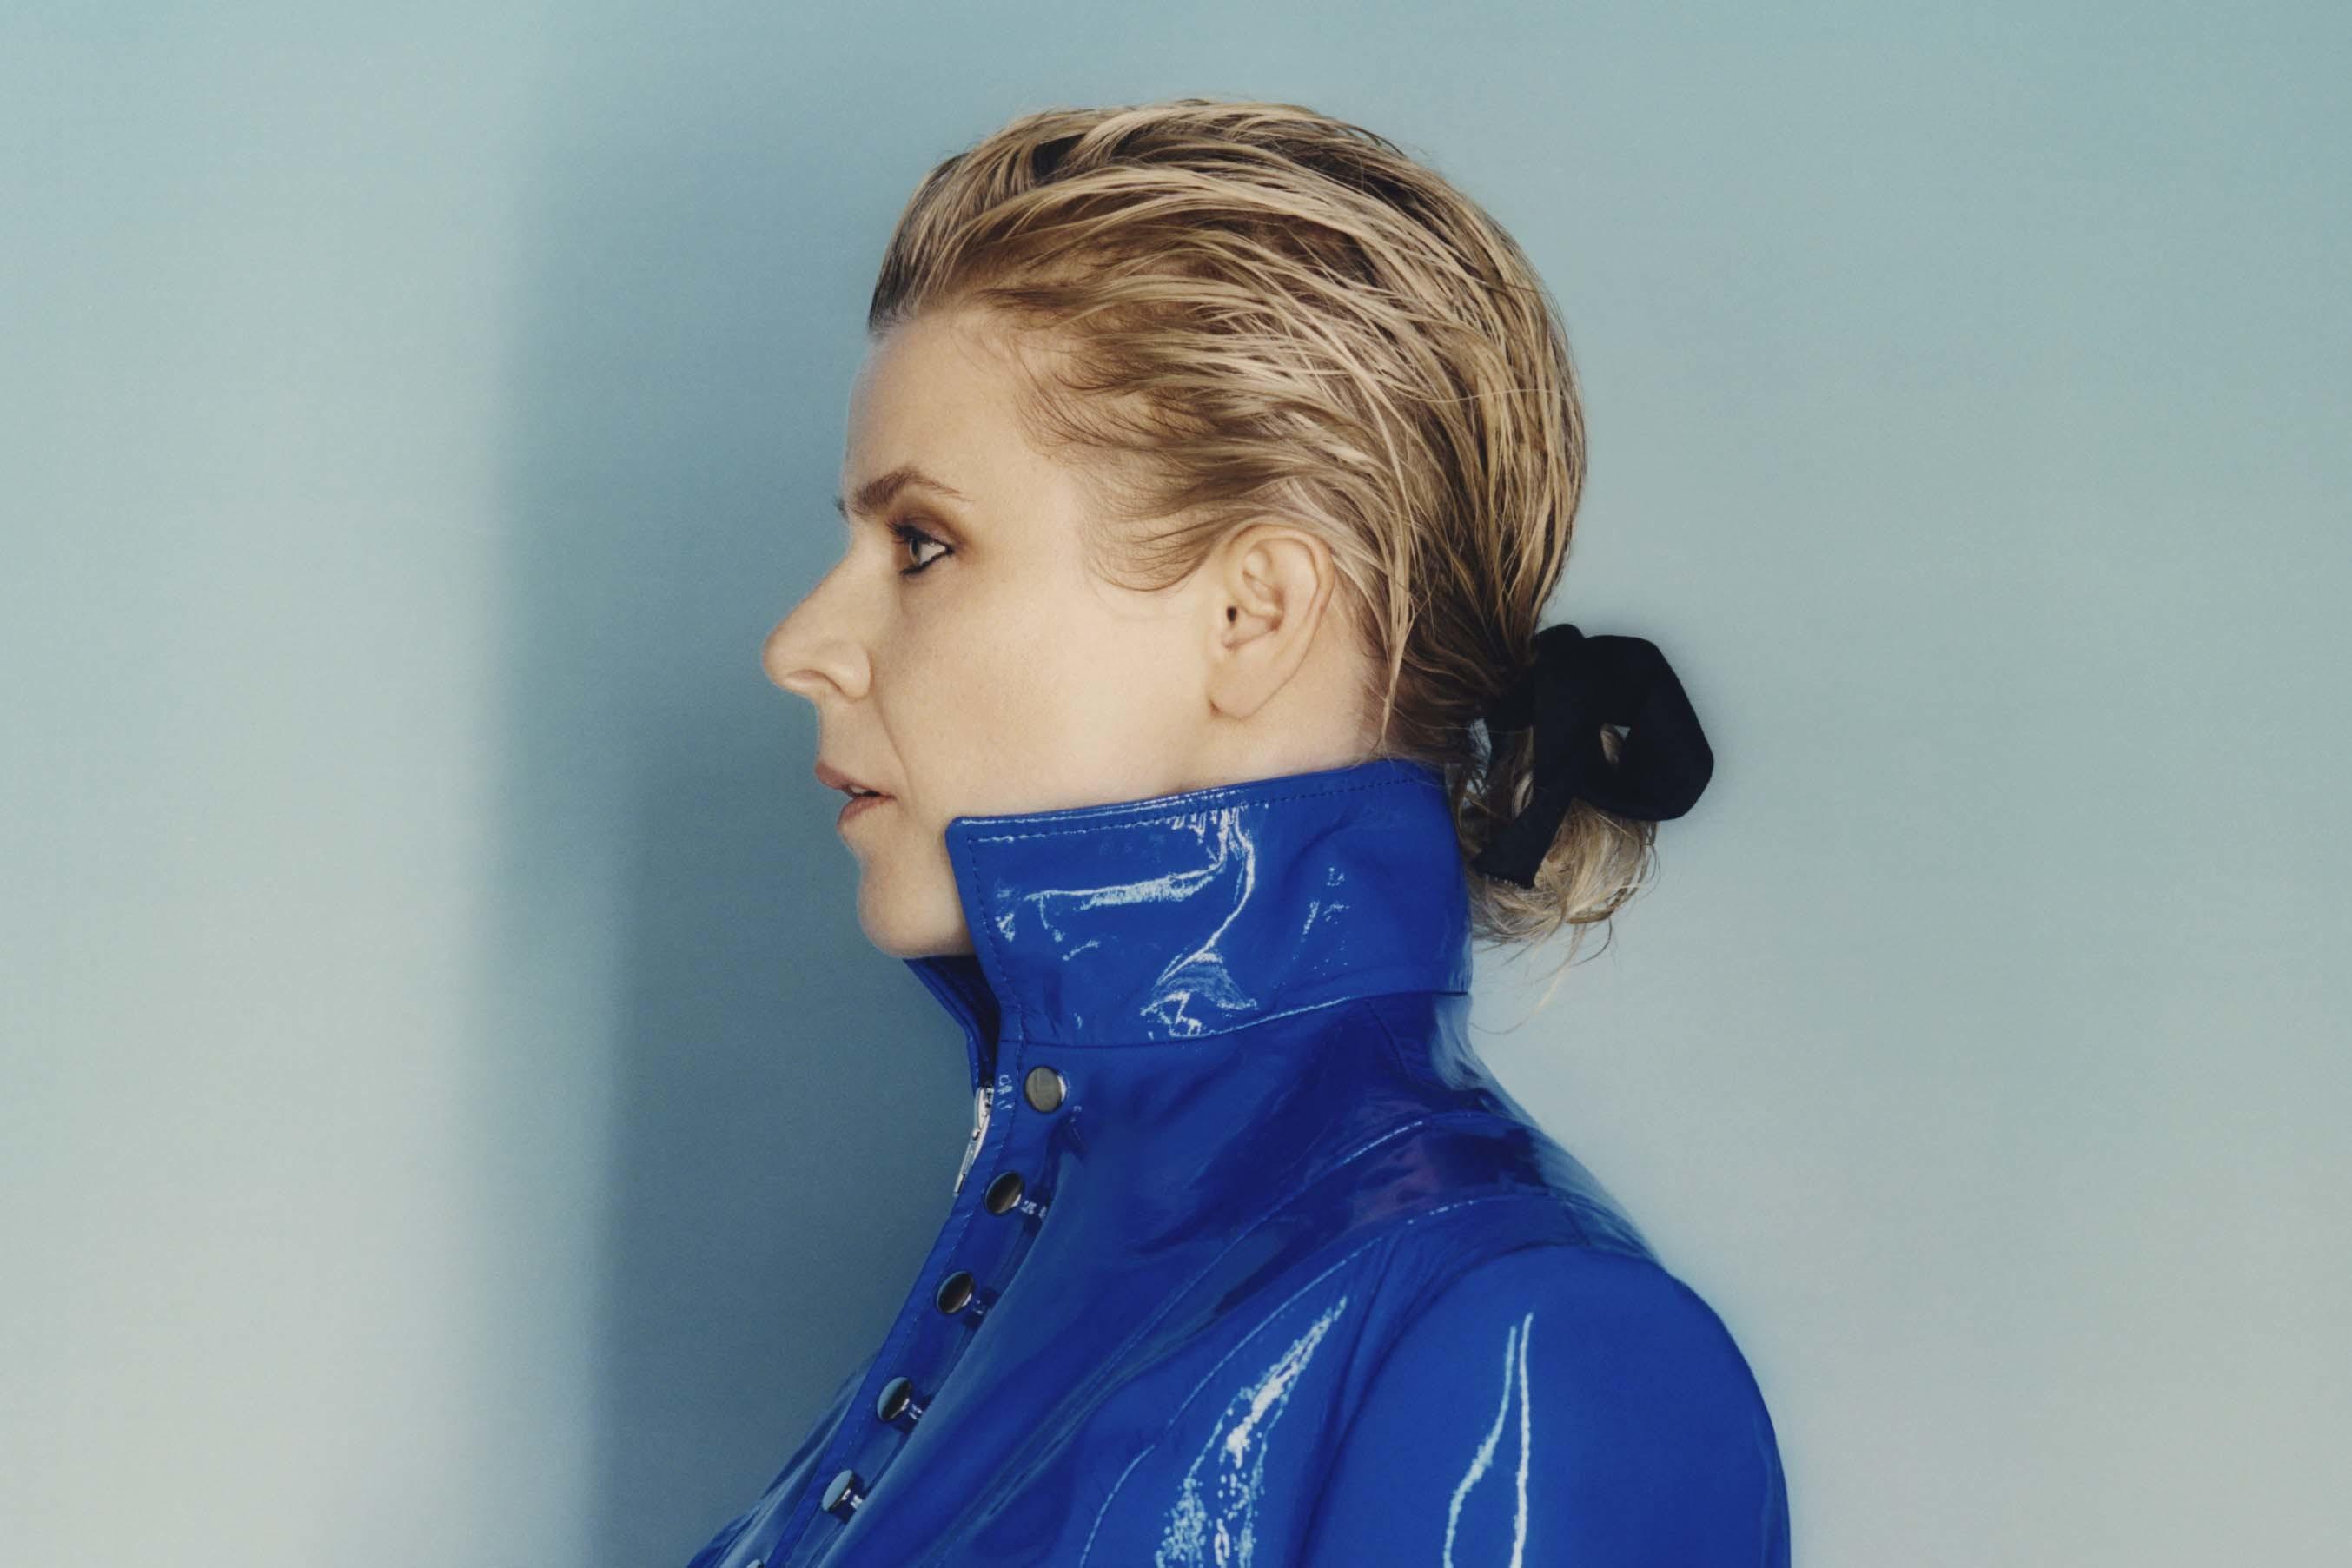 Listen to Robyn's new single 'Missing U'